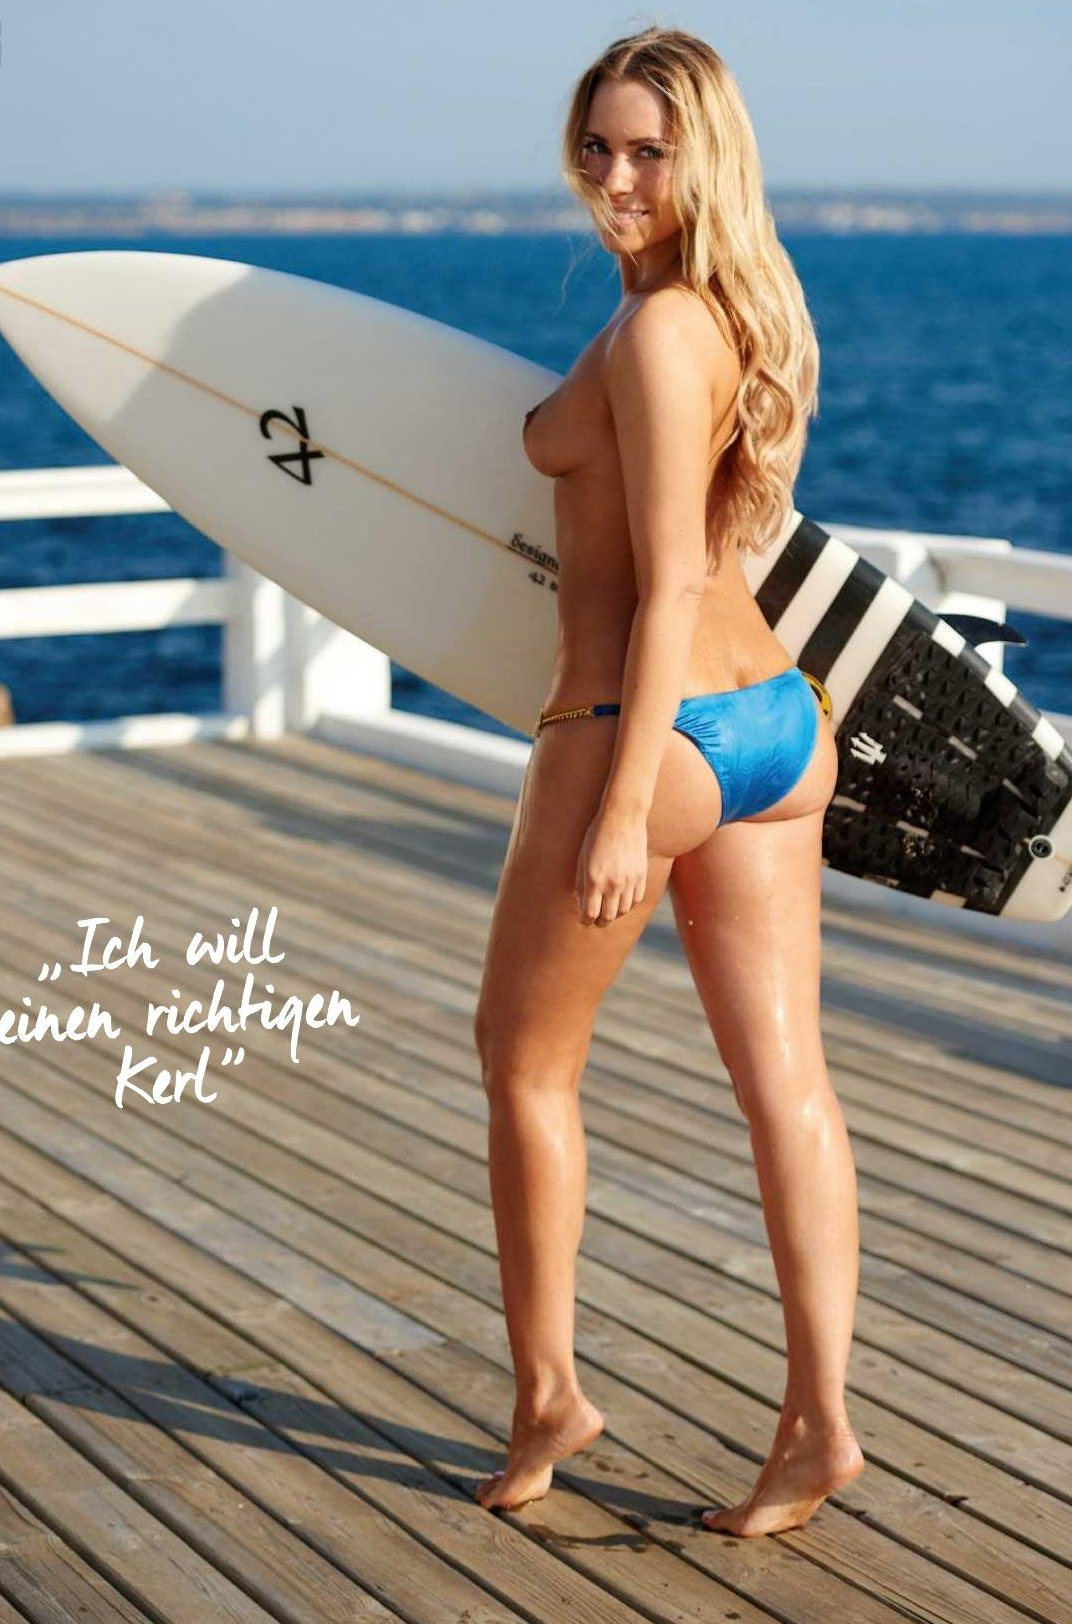 Лара-Изабель Рентинк голая. Фото - 10